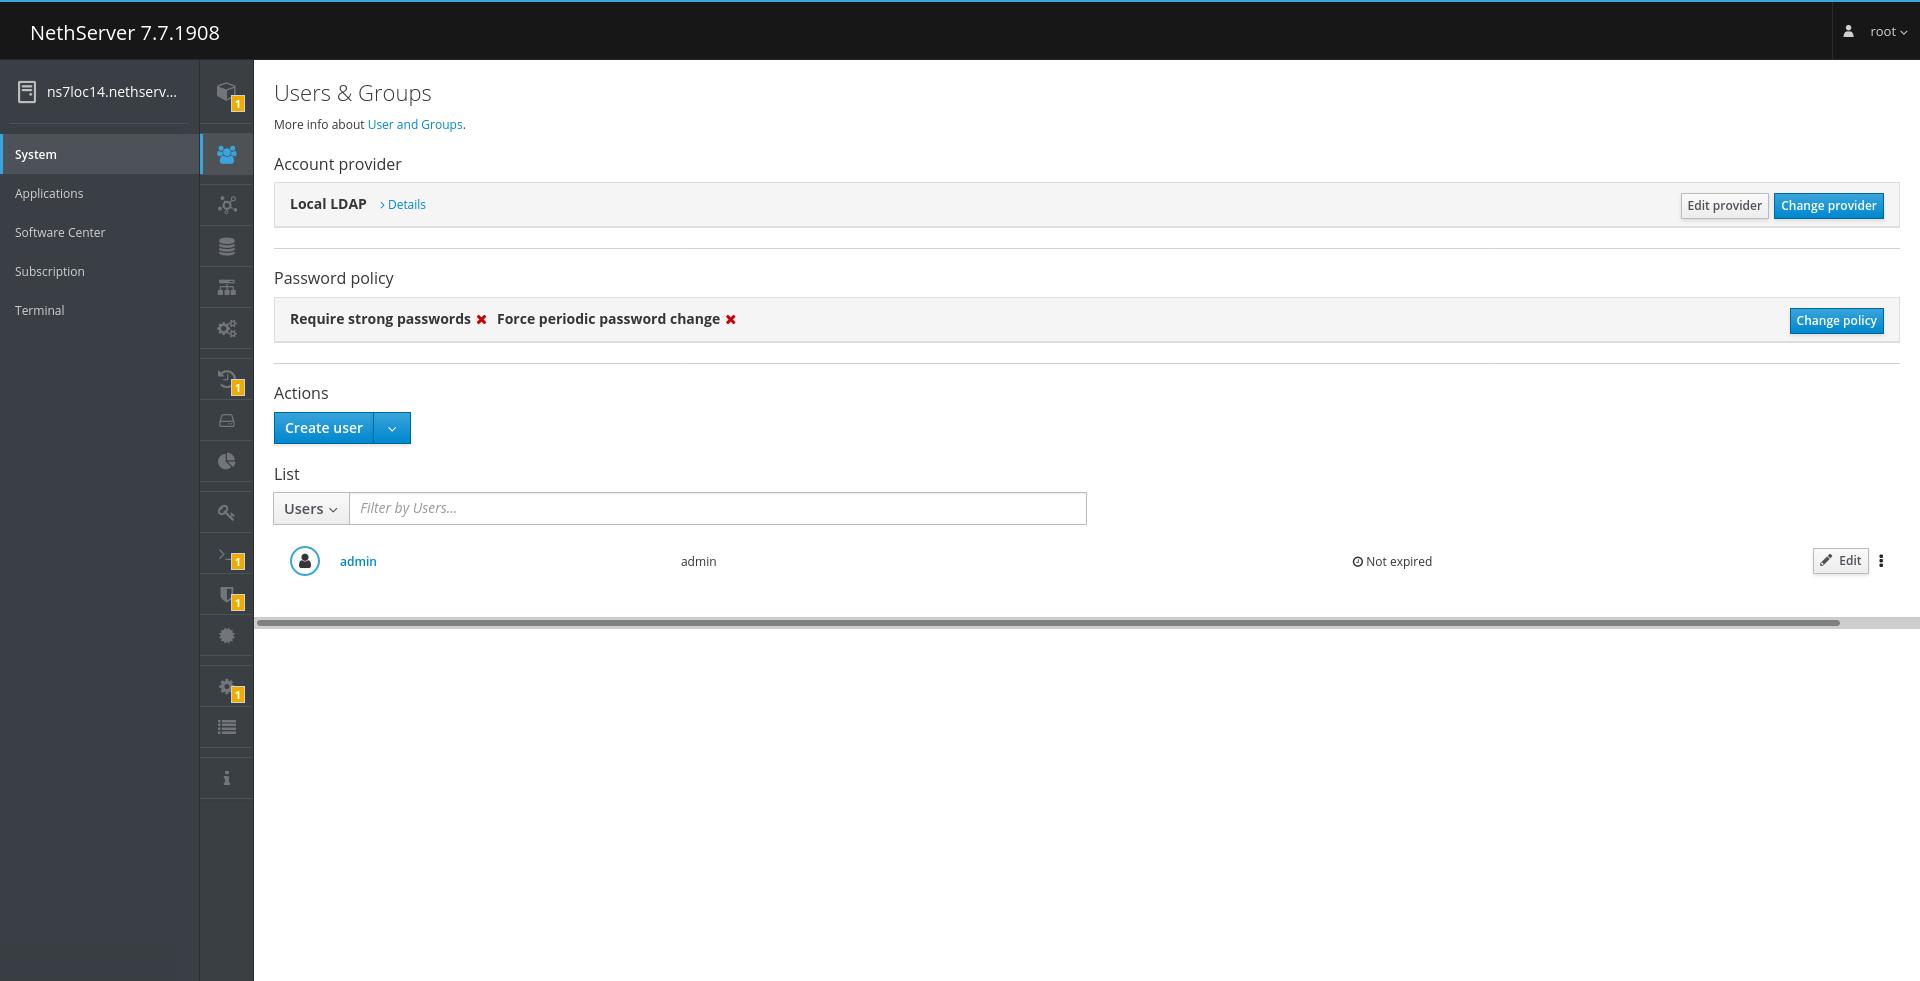 Screenshot_2019-12-08 Users Groups - ns7loc14 nethservertest org